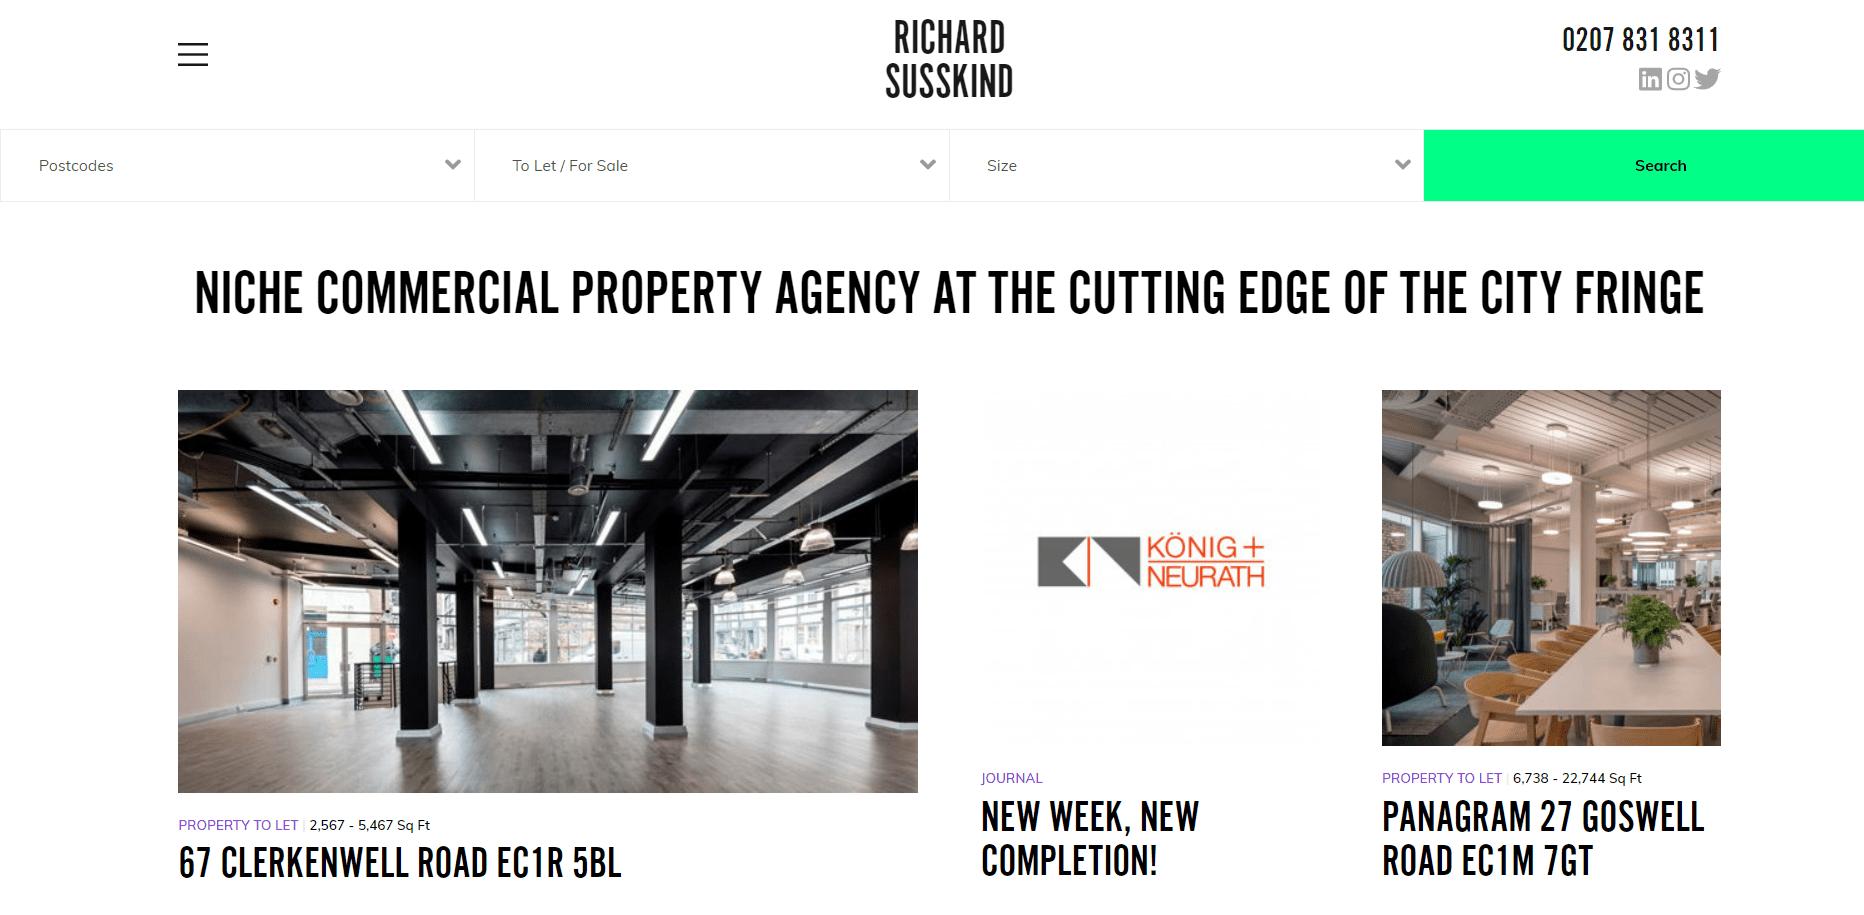 Richard Susskind & Company